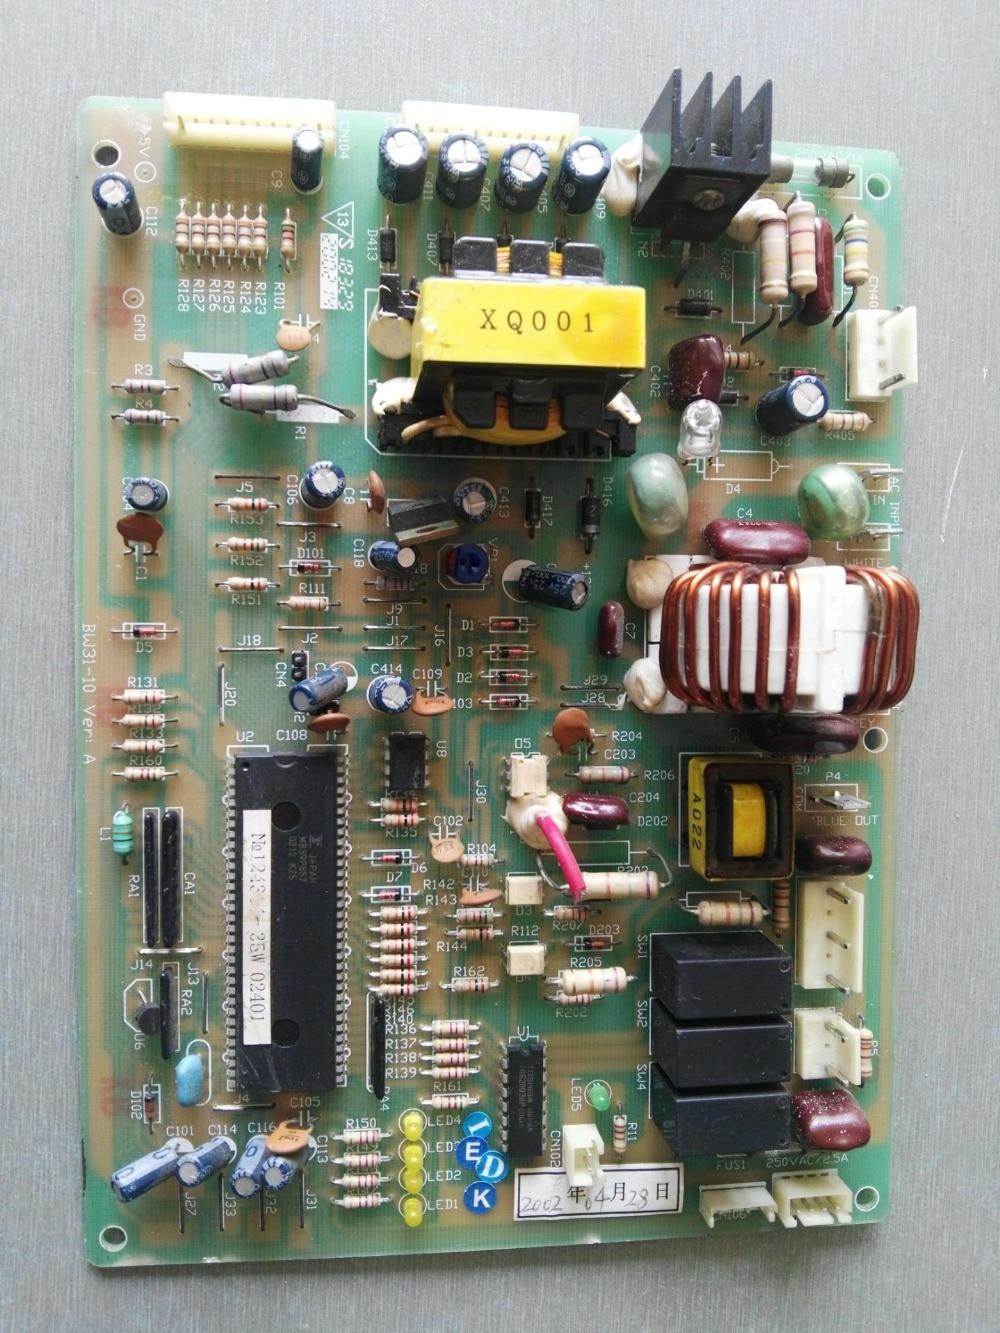 KFR-35W 02401 BW31-10 Good Working Tested